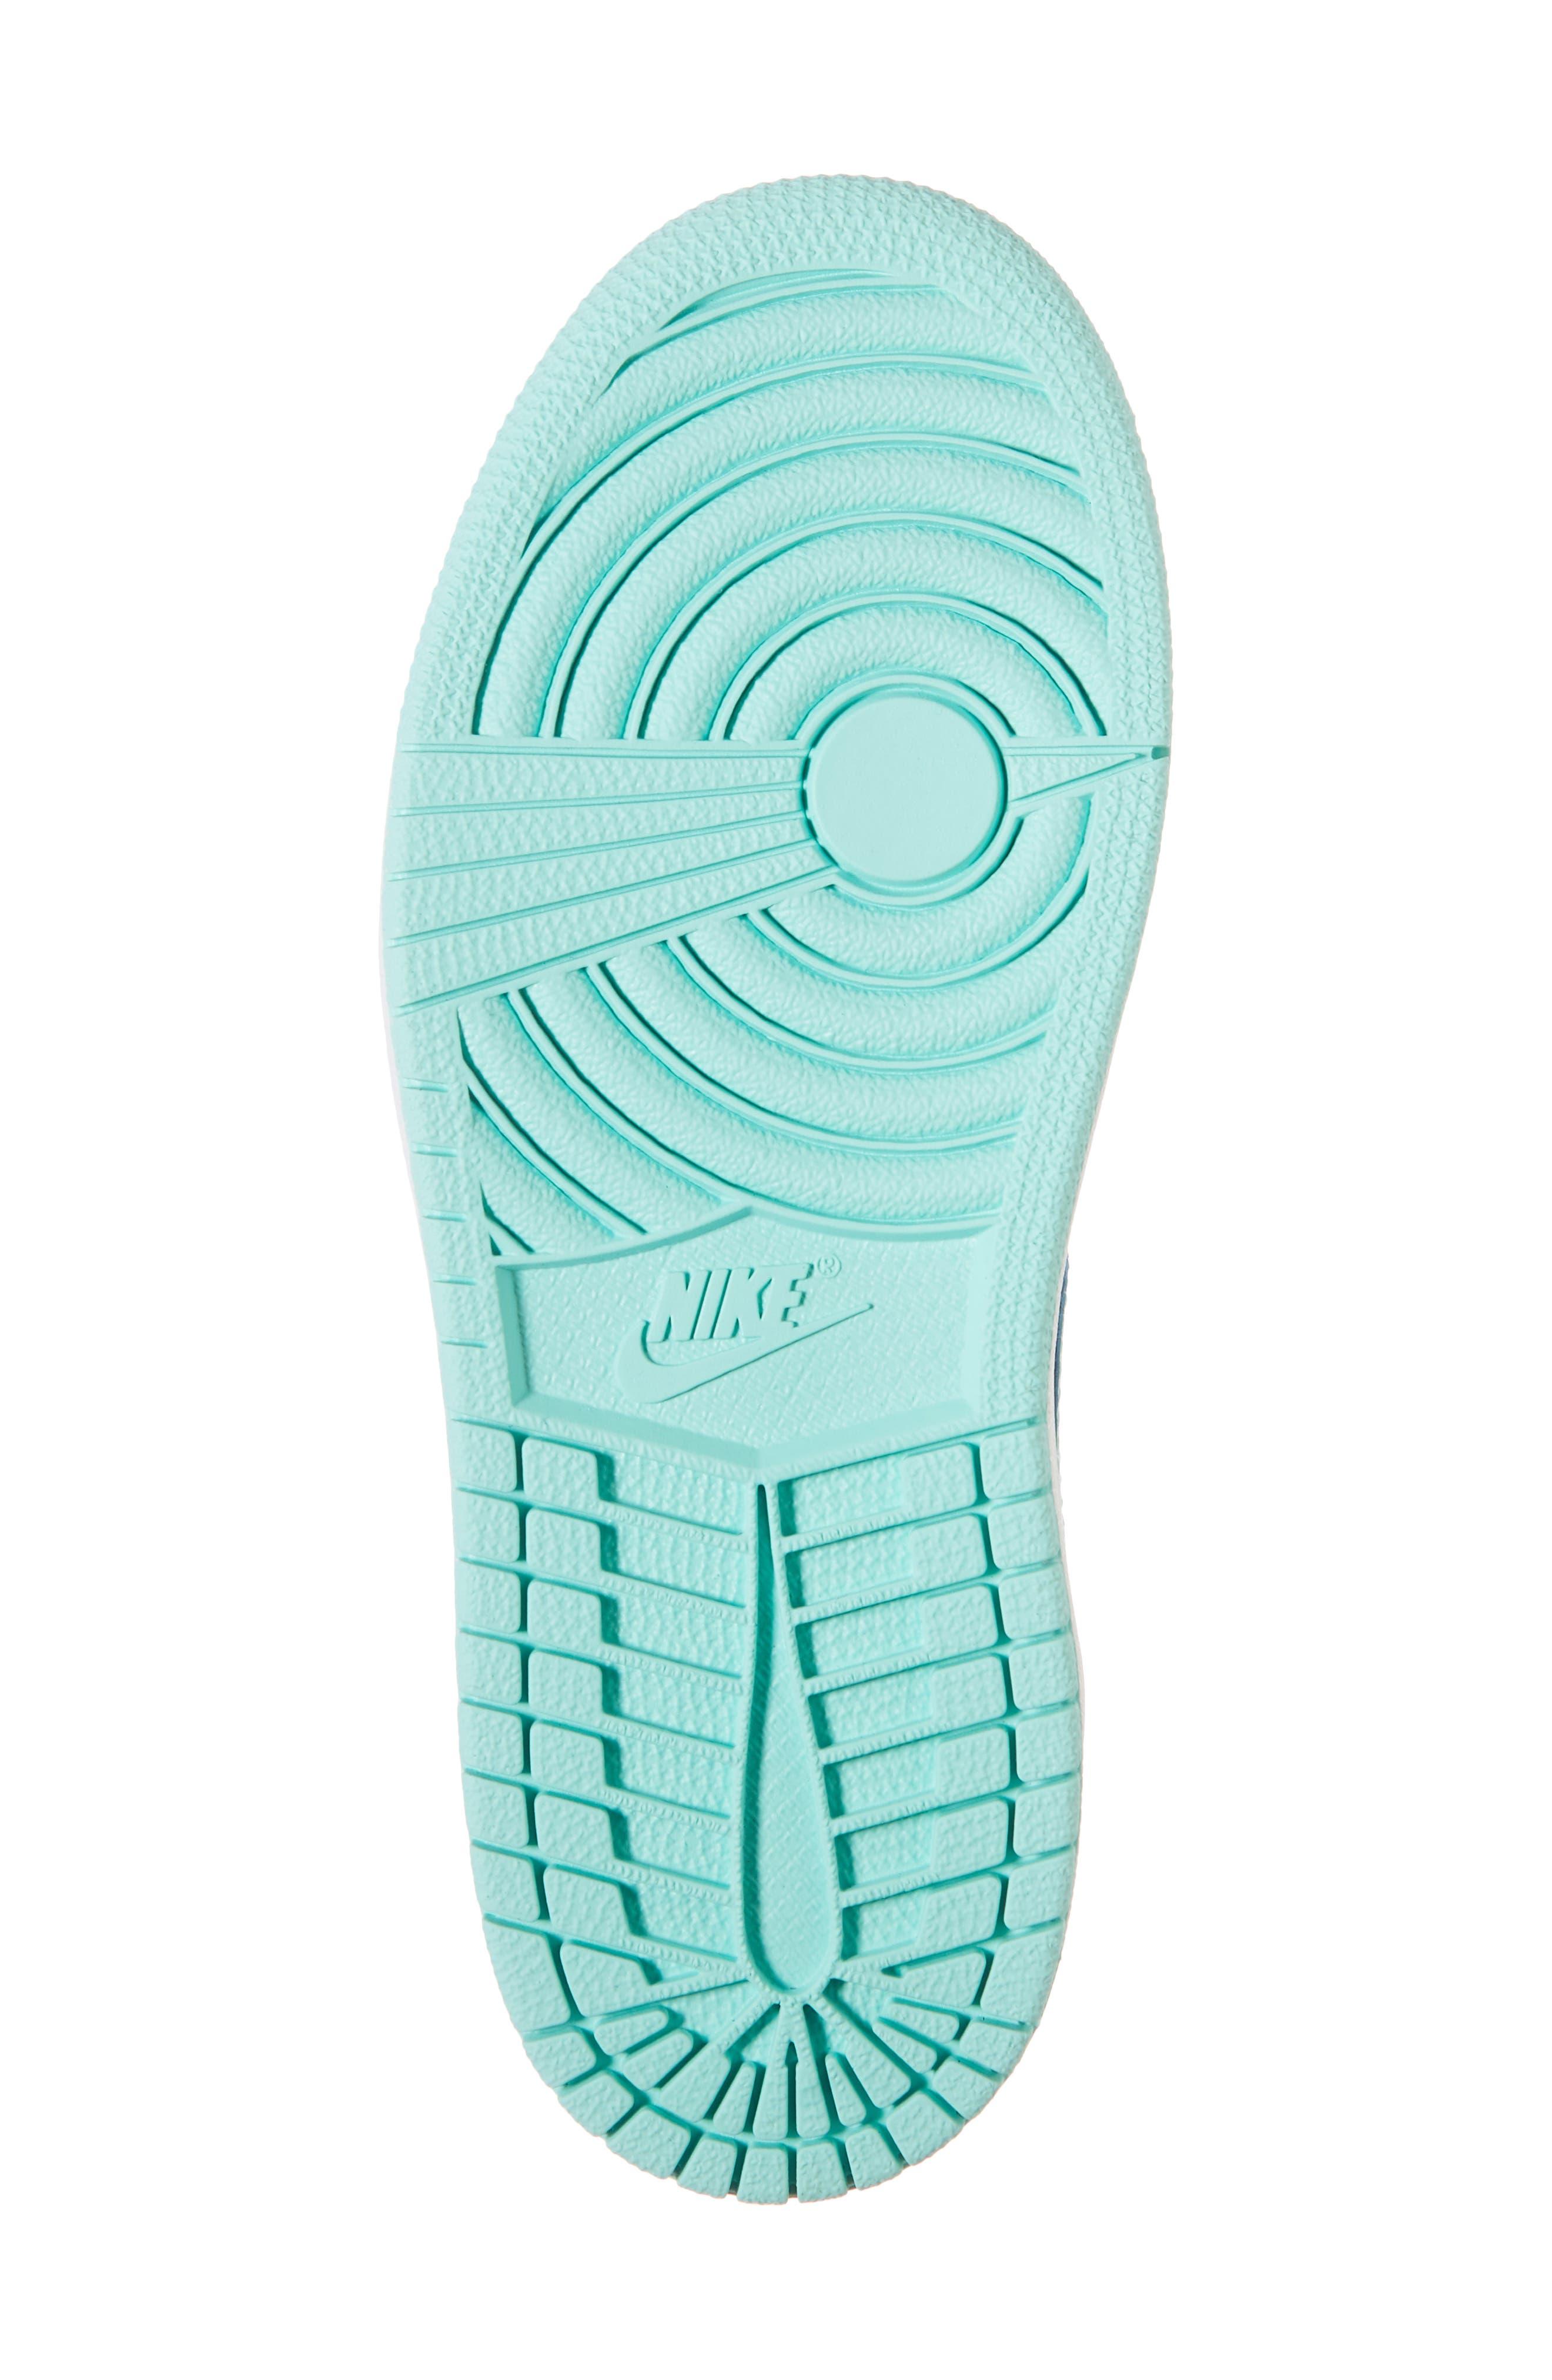 Nike 'Jordan 1 Mid' Basketball Shoe,                             Alternate thumbnail 6, color,                             INK/ EMERALD RISE/ WHITE